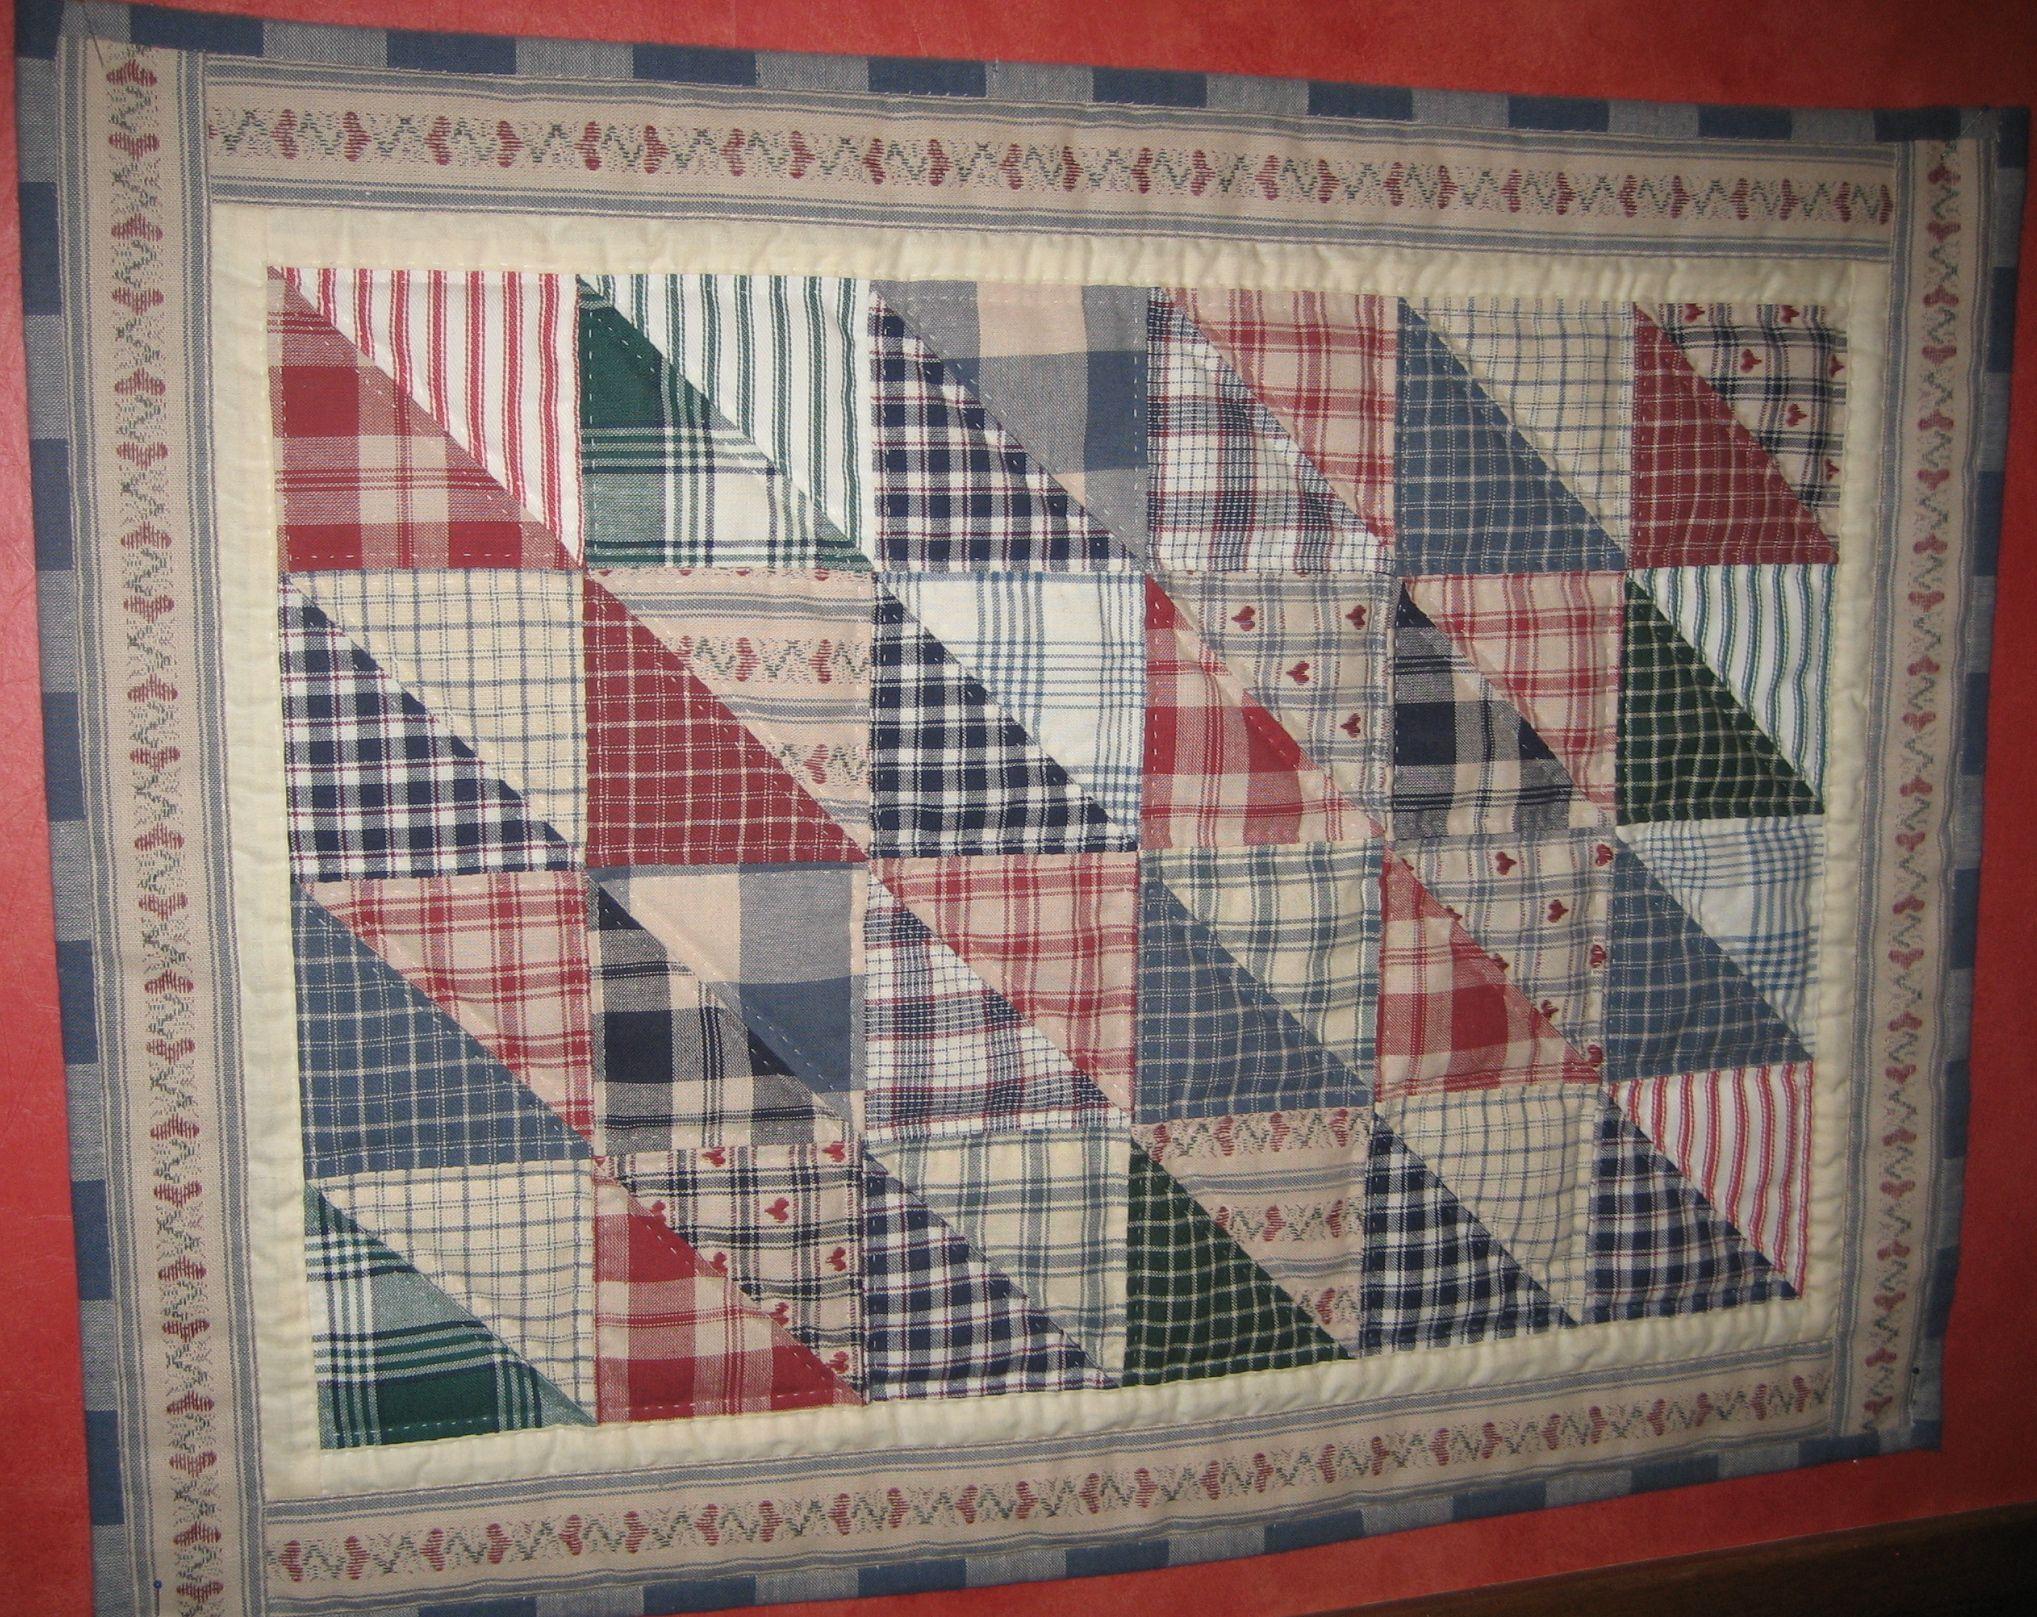 Small handmade homespun quilt Quilts and Fabric Pinterest